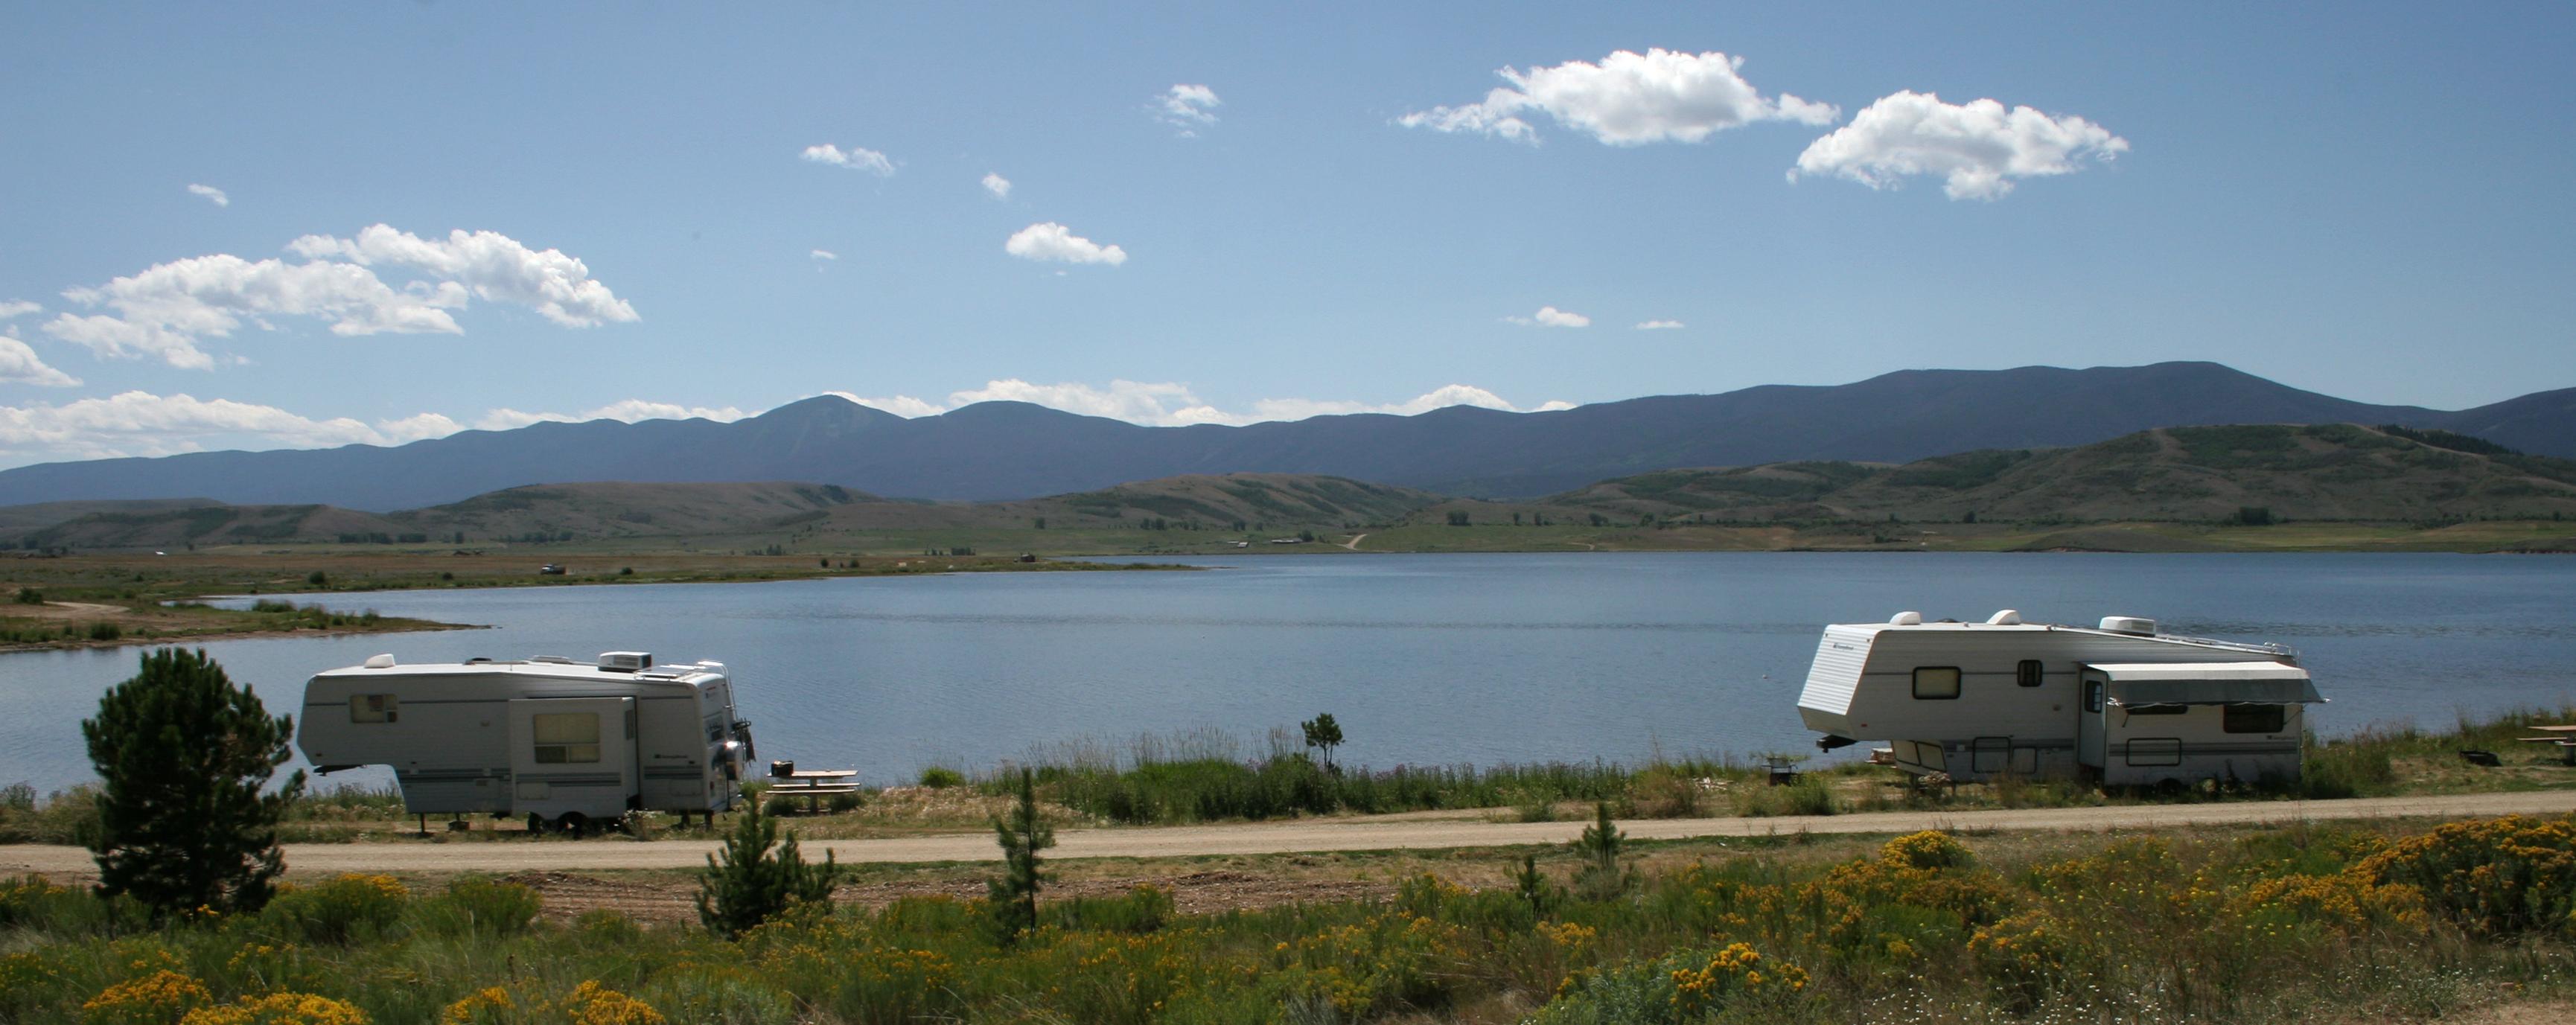 Williams fork reservoir denver water for Colorado fishing limits